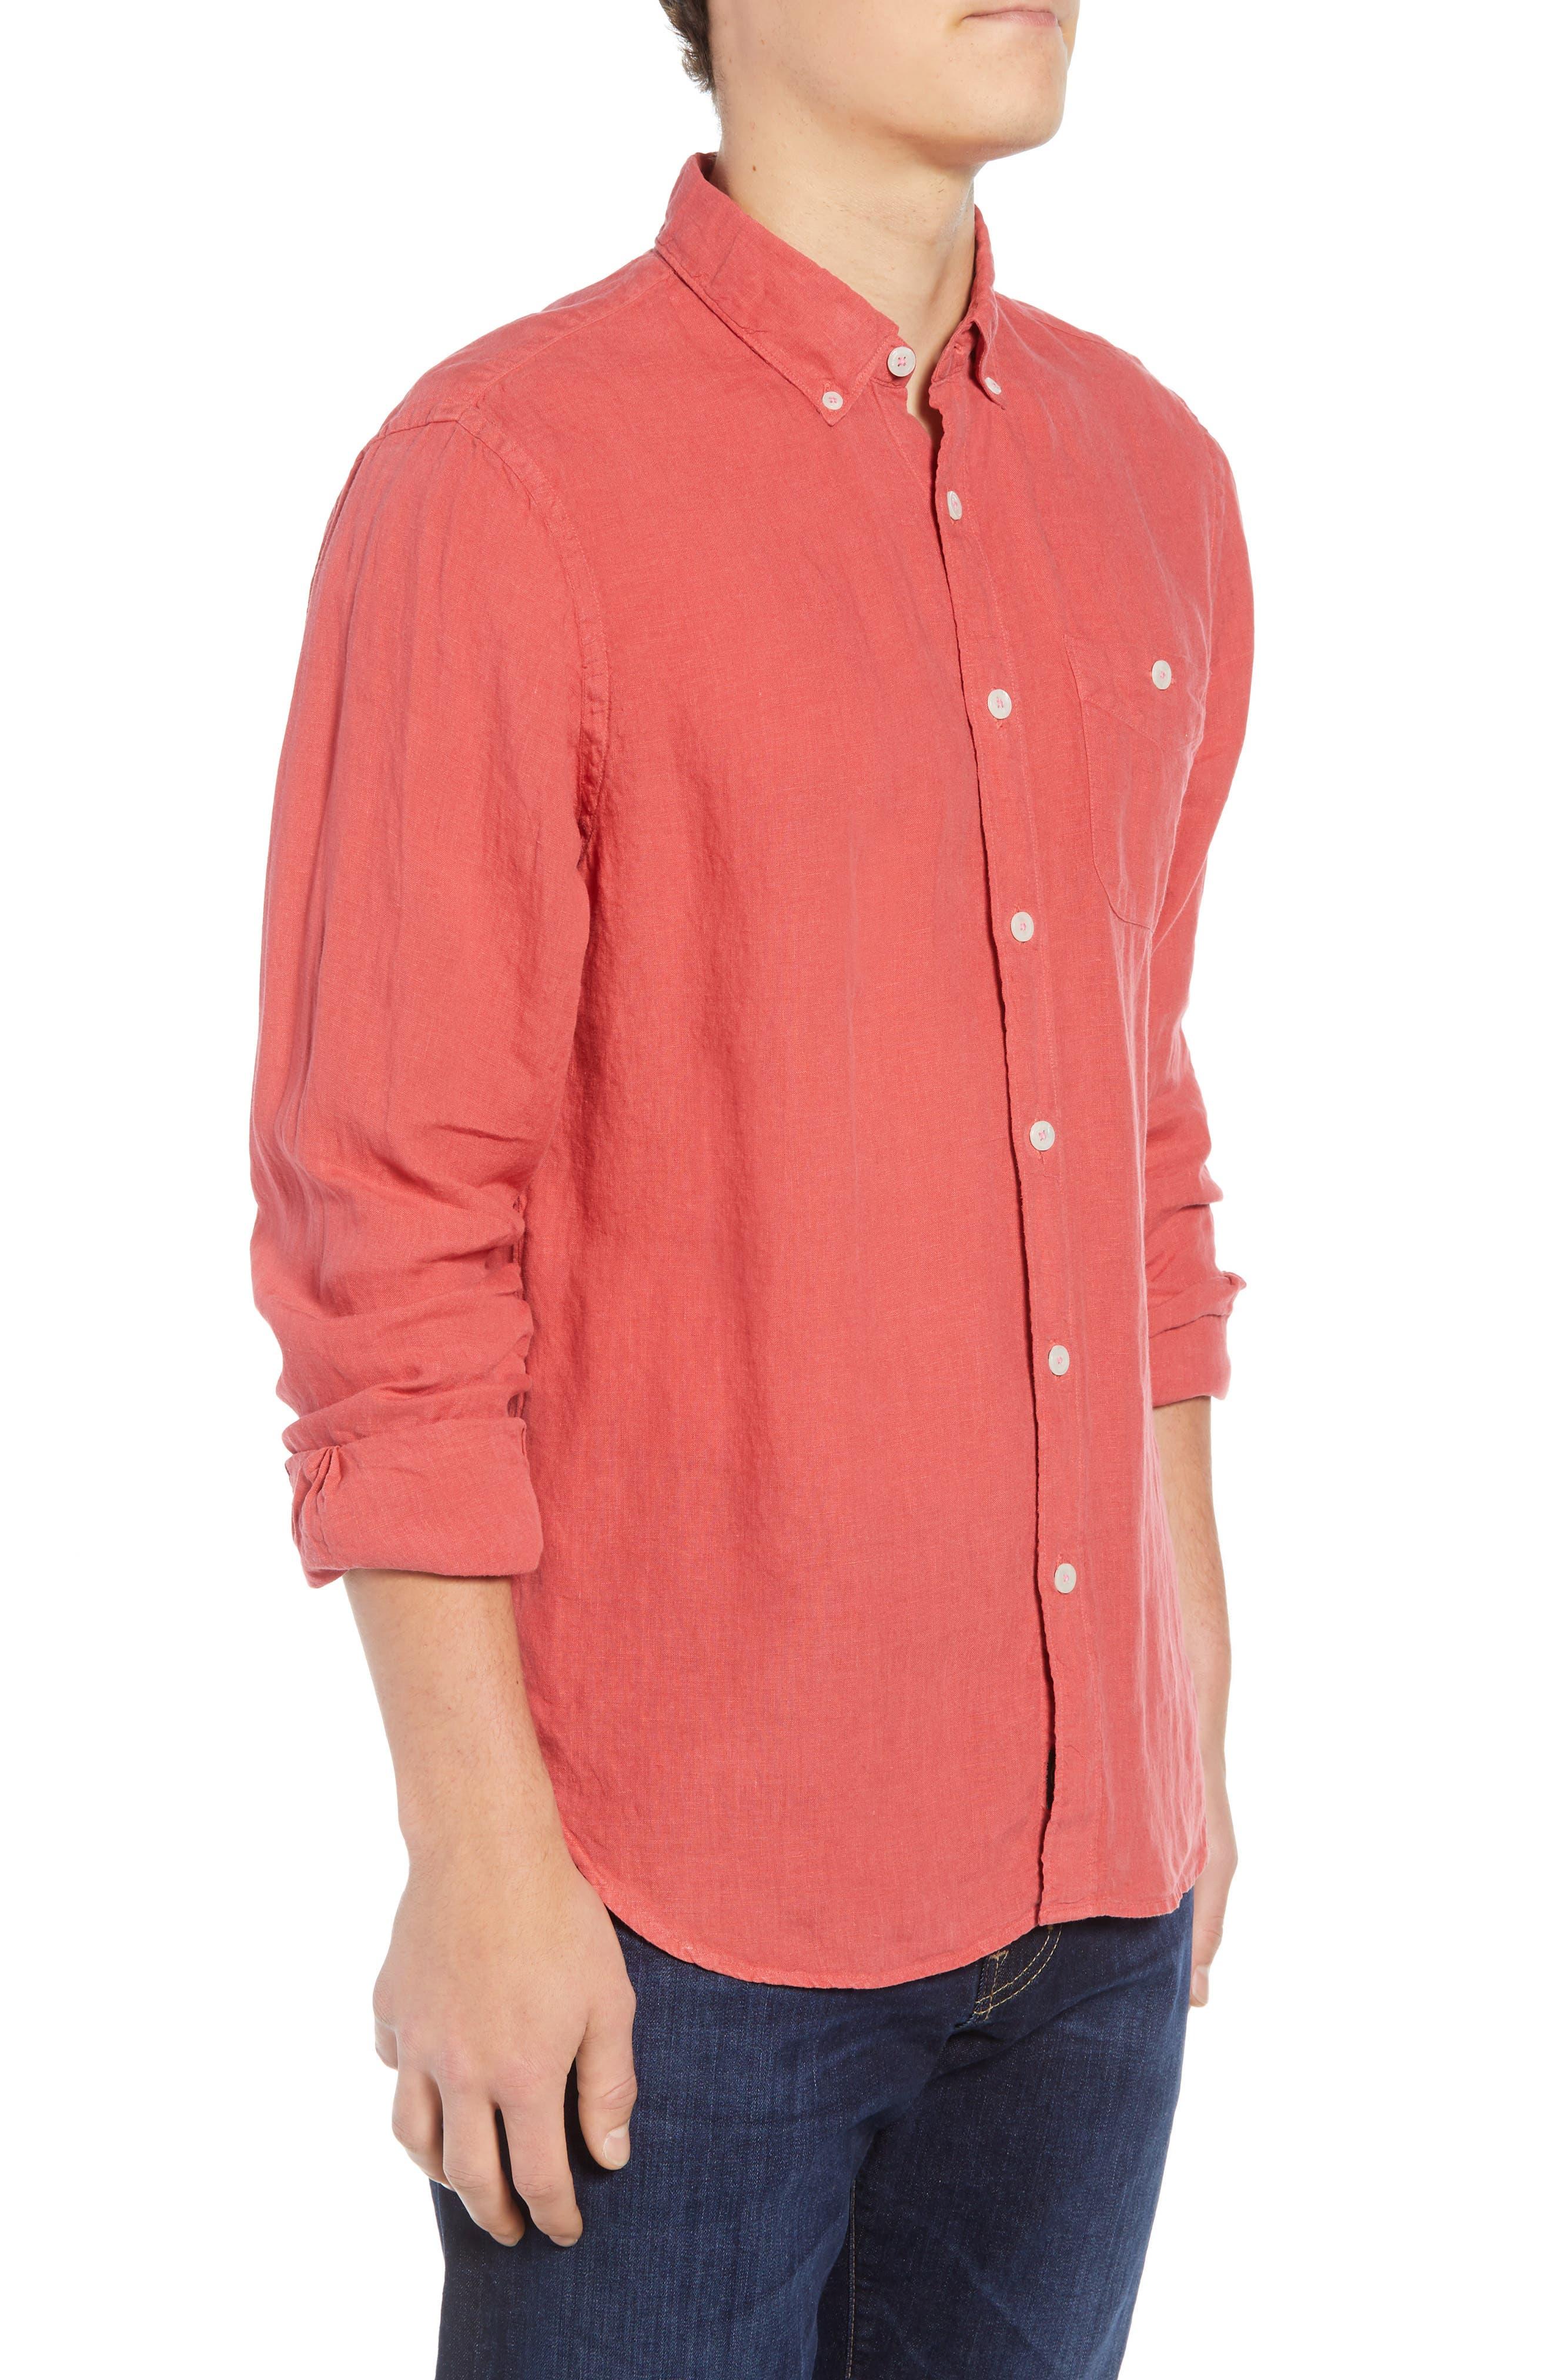 TODD SNYDER,                             Regular Fit Linen Sport Shirt,                             Alternate thumbnail 4, color,                             647